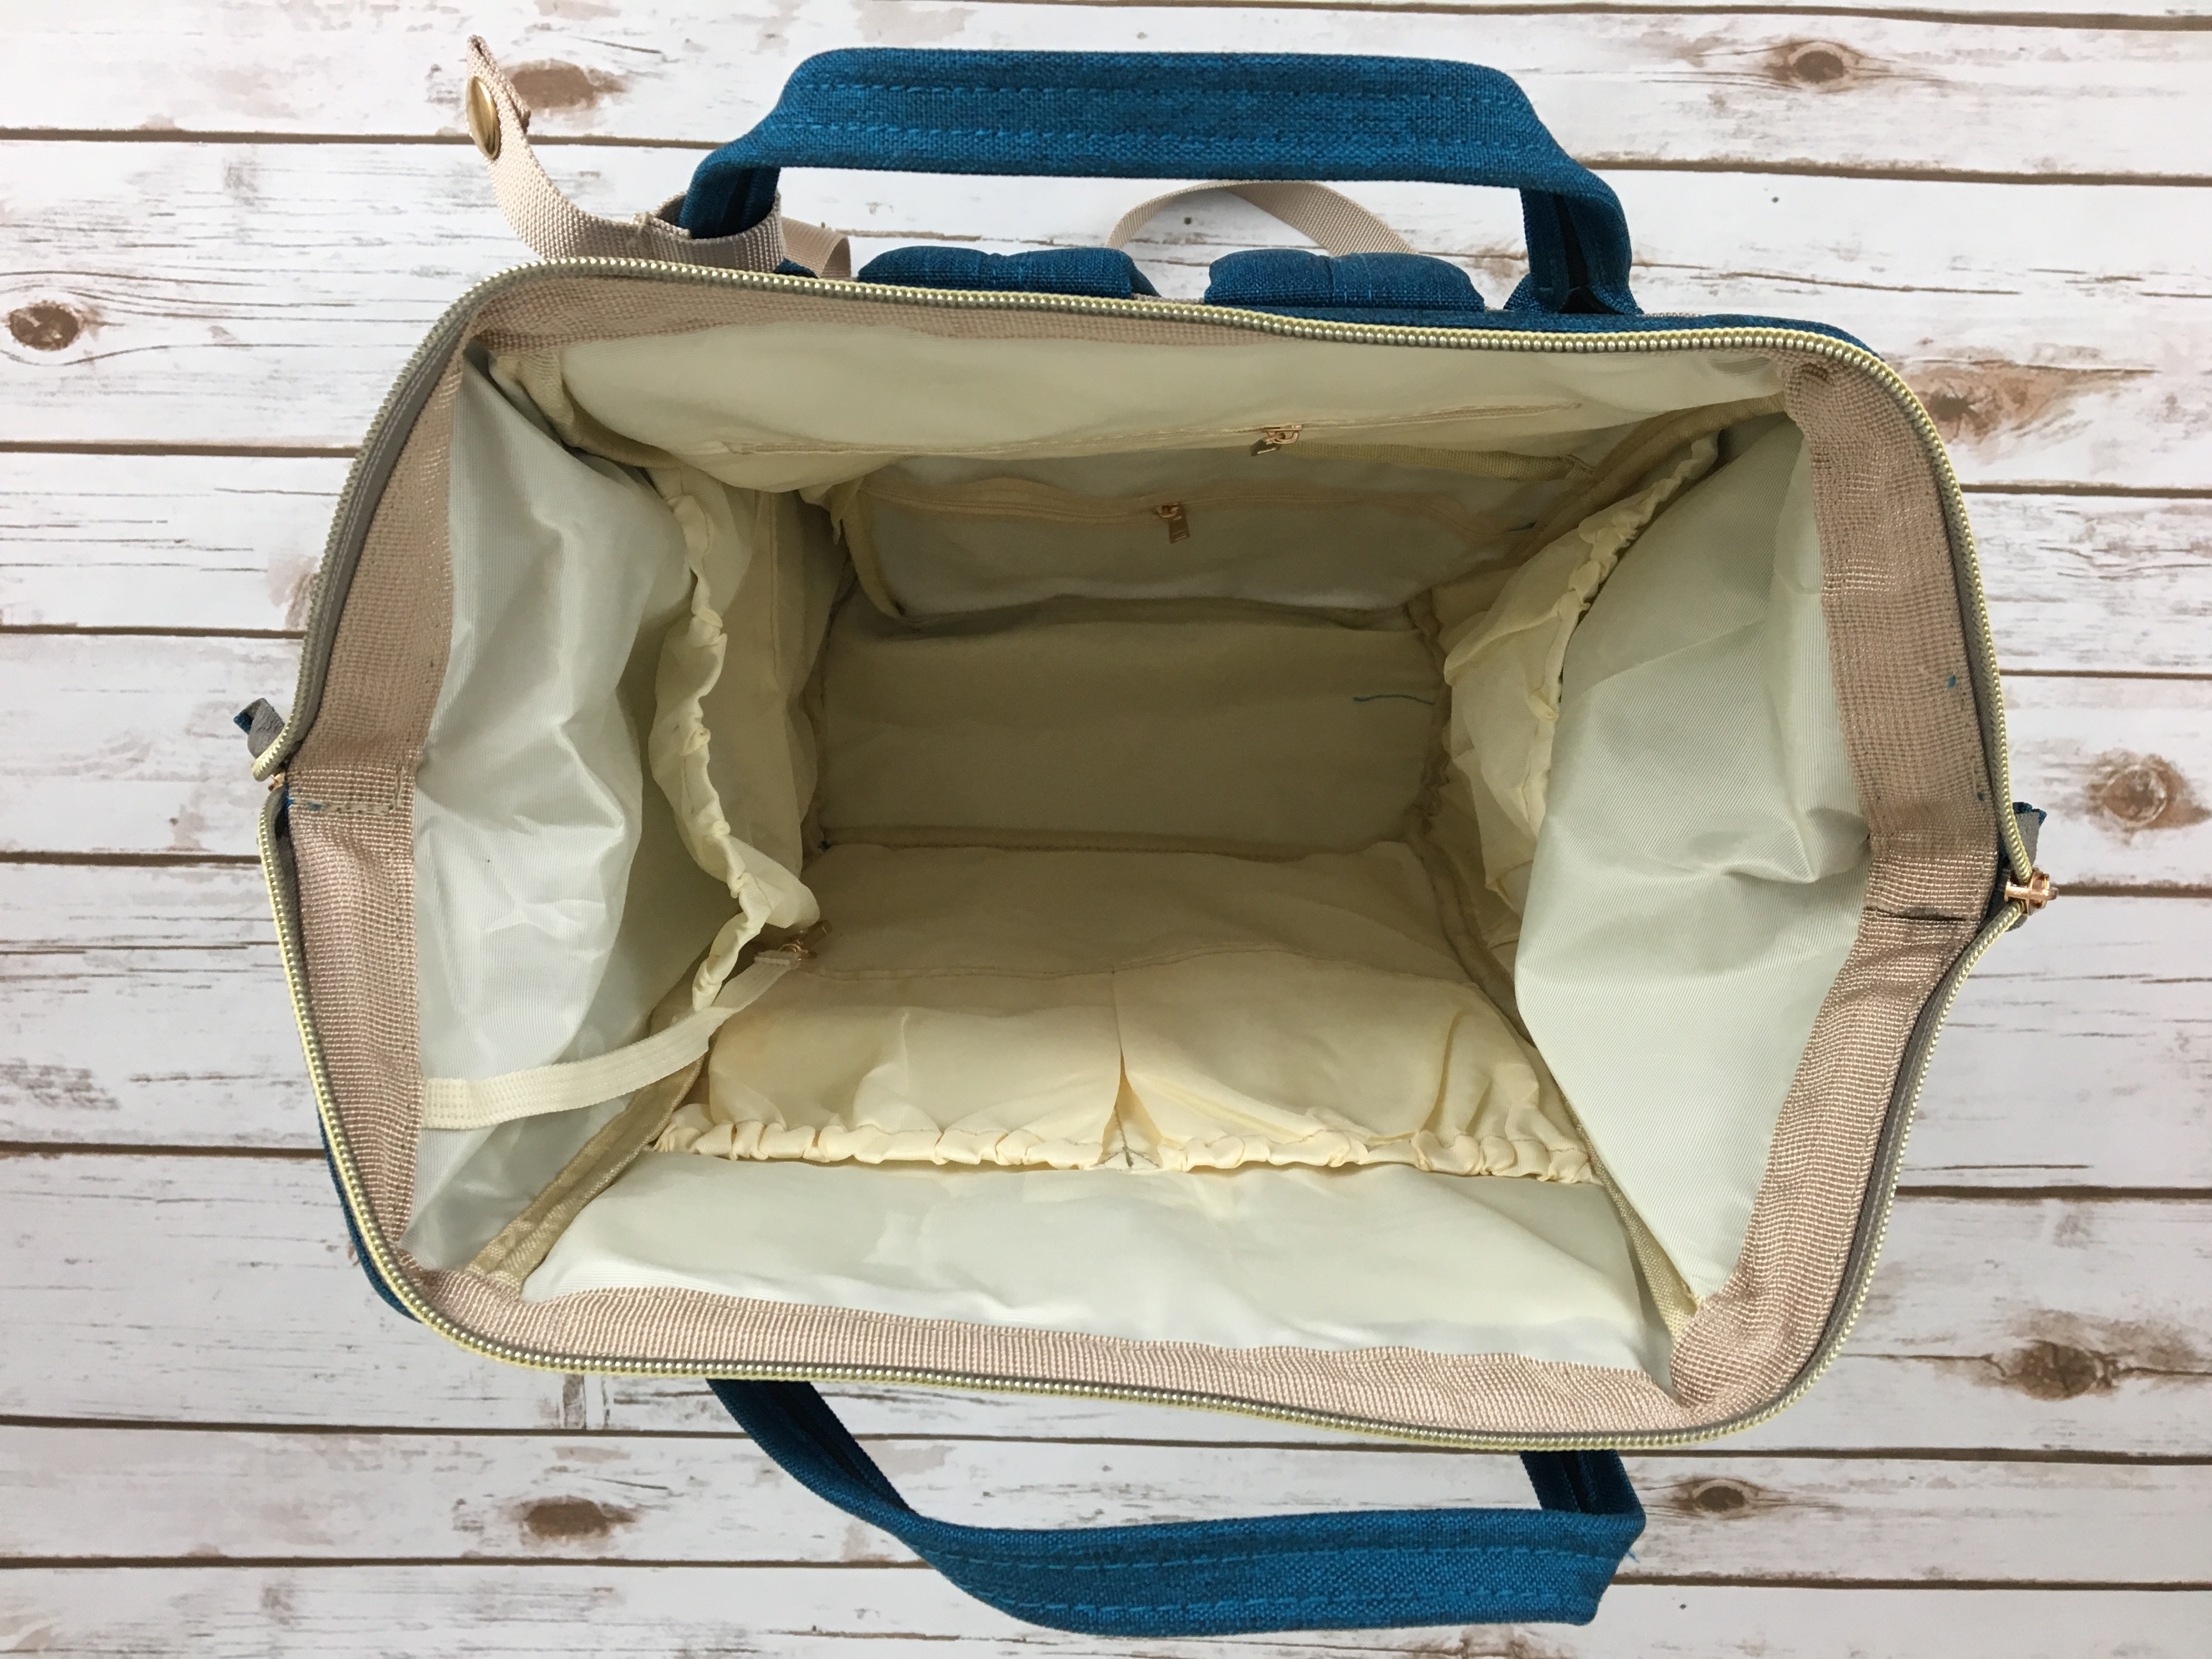 fd1e8fe849be Diaper Bag Backpack - Wildflower Lane Creations